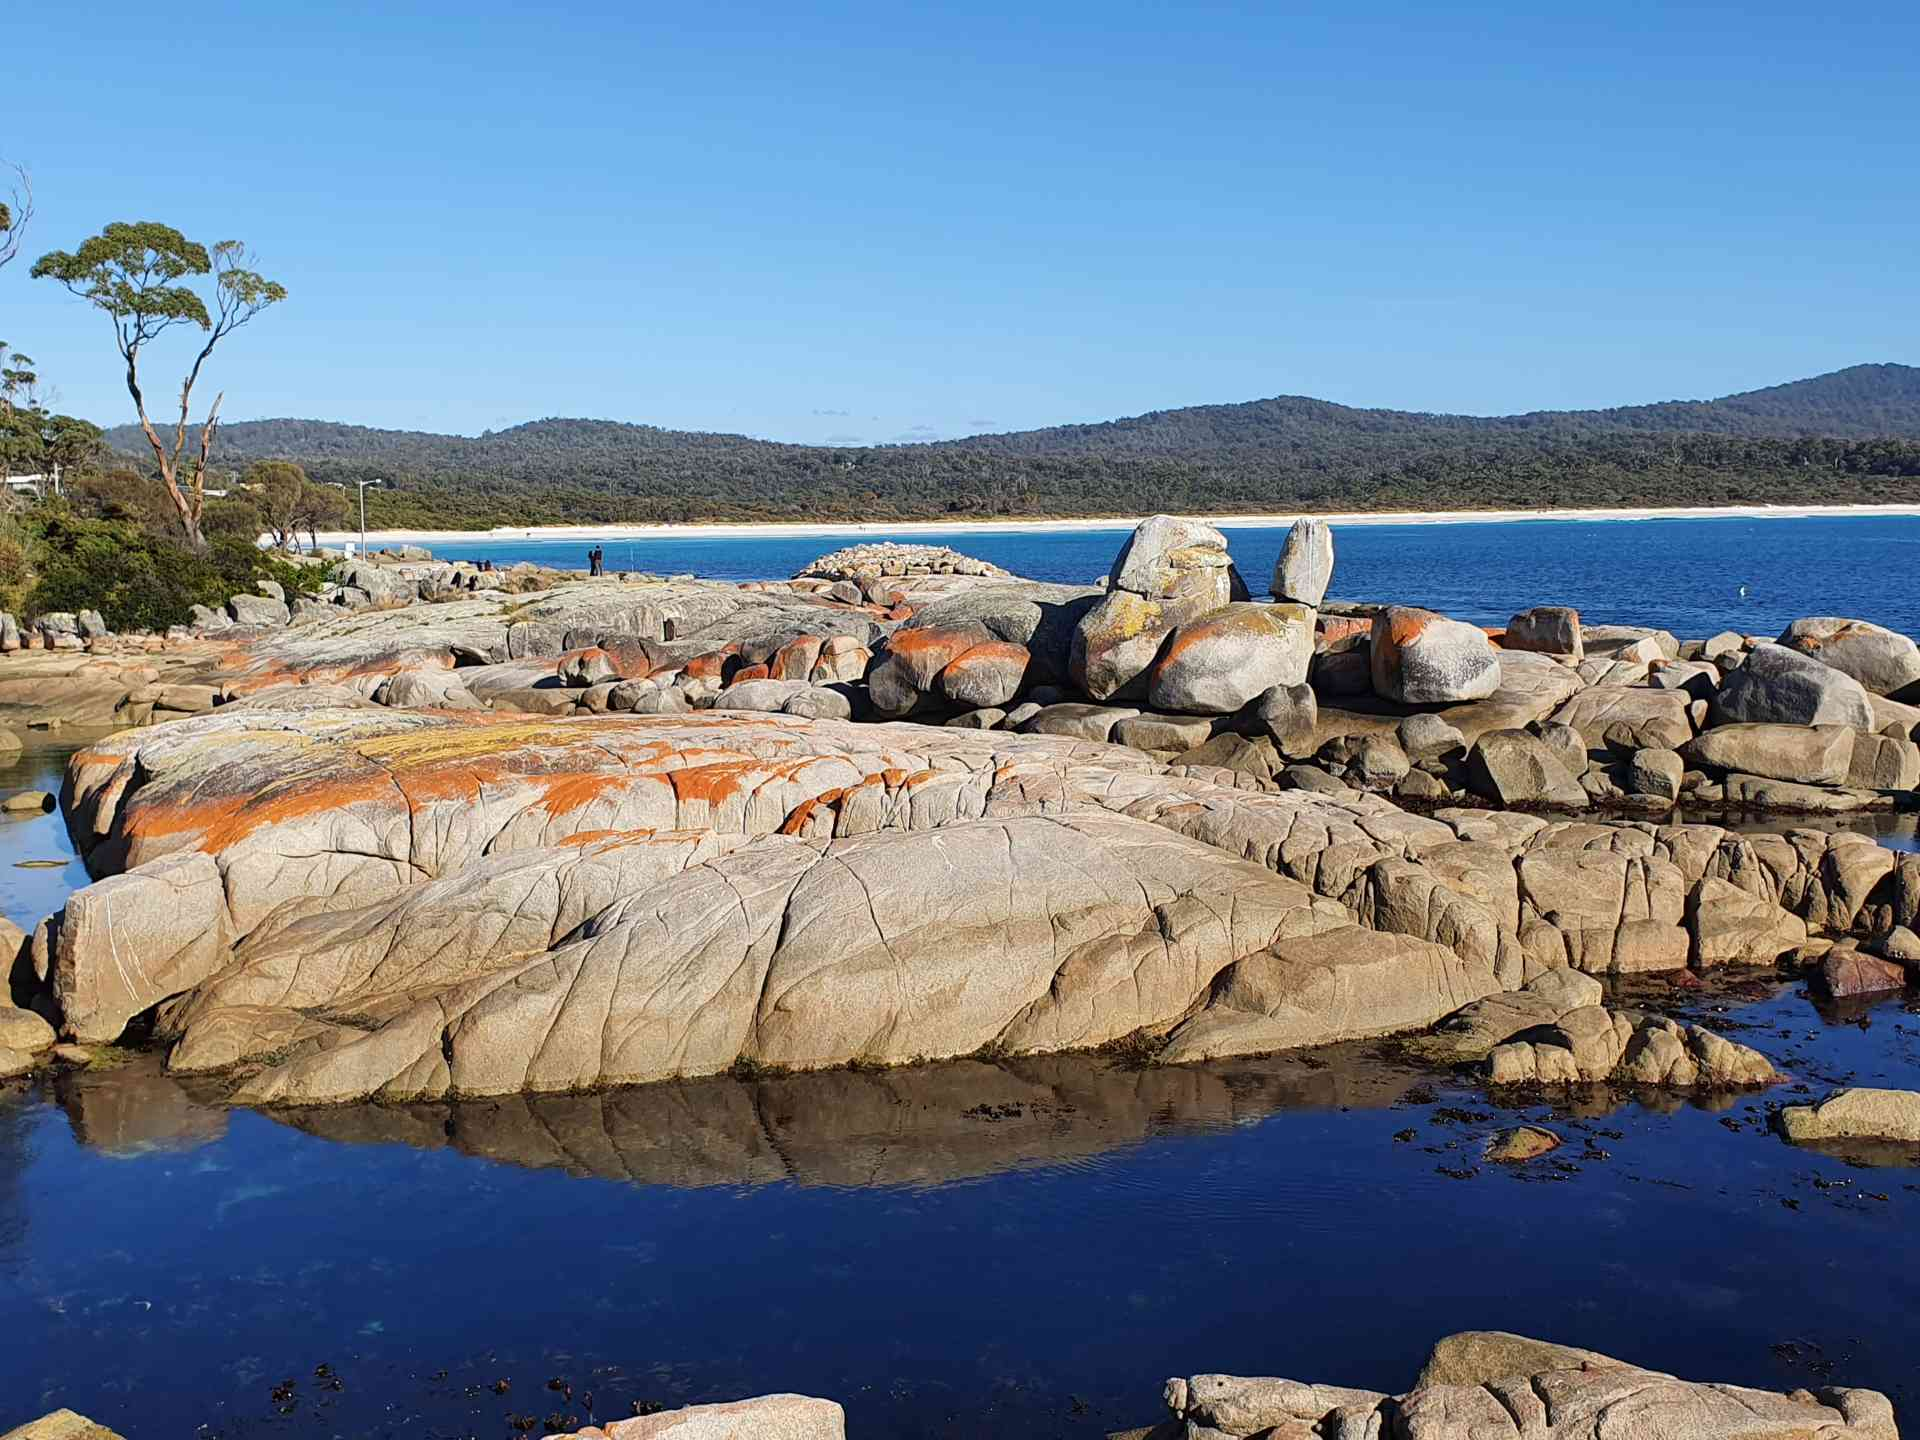 Binalong Bay, Tasmania by Annelieke Huijgens